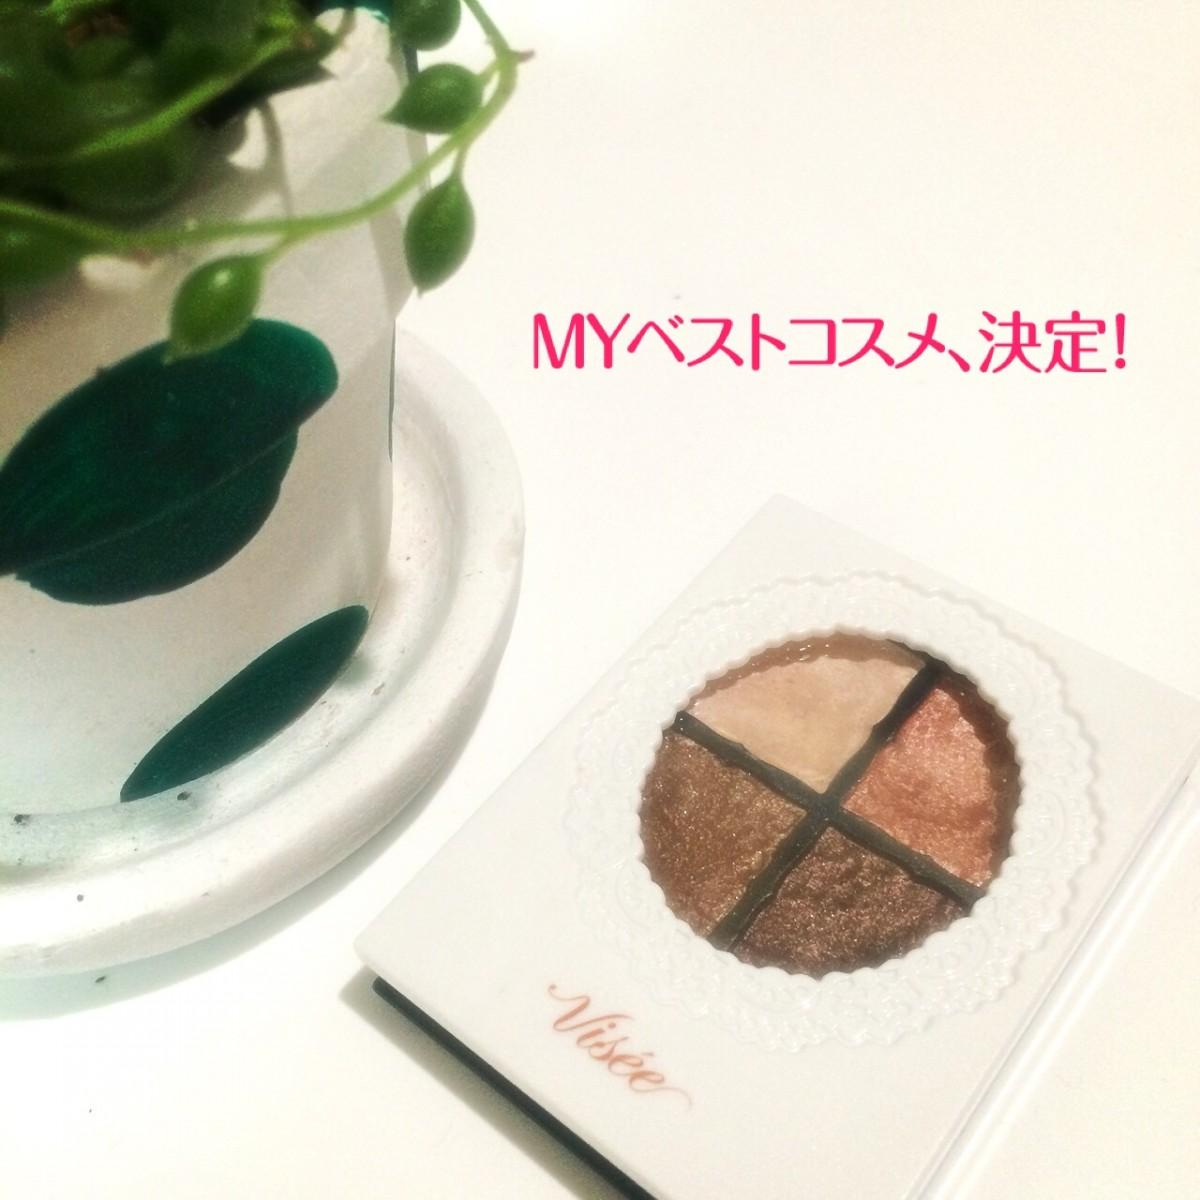 MYベストコスメ 2014 & 最強プチプラコスメ 【アイシャドウ編】